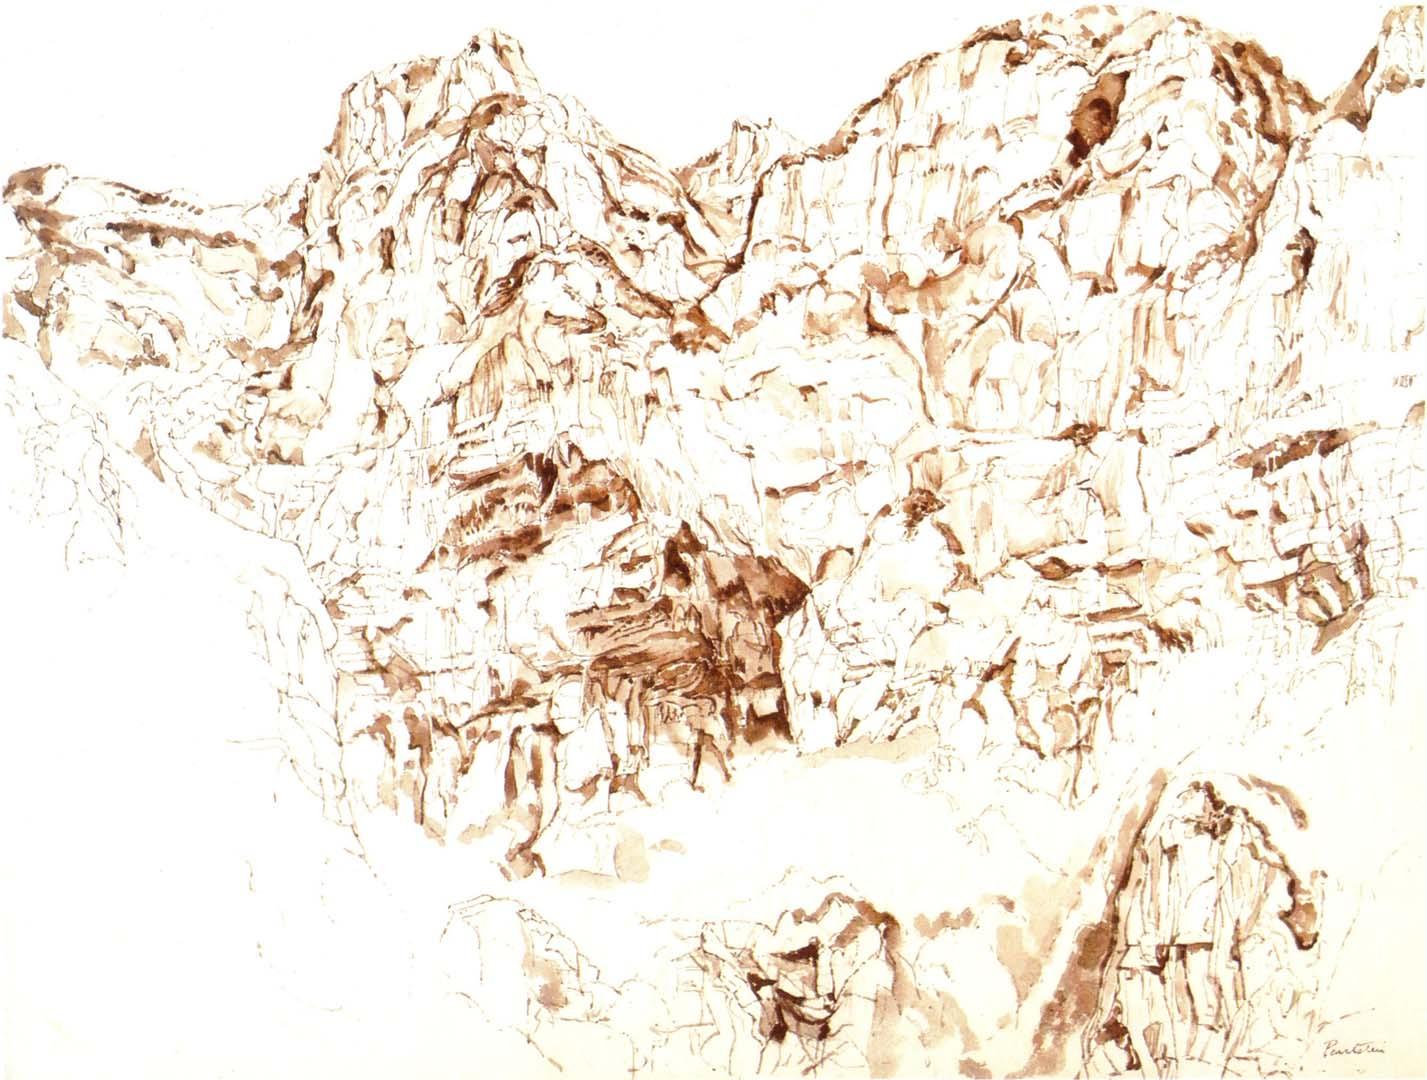 1959 Positano Sepia Wash on Paper 20.75 x 27.375